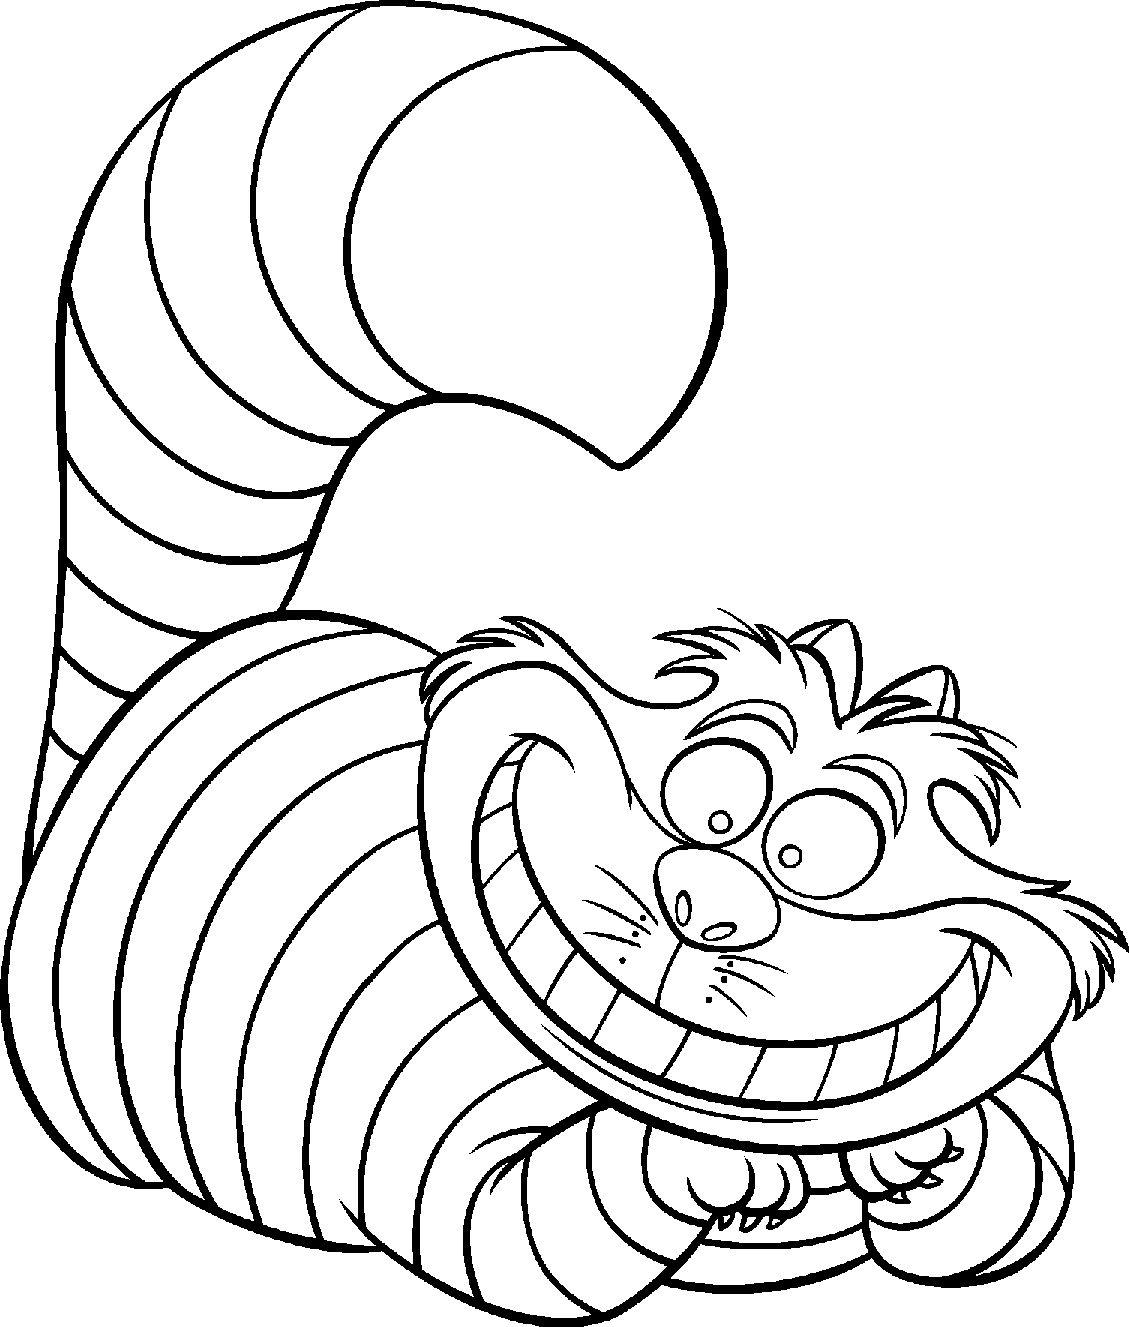 1129x1327 Cat Clip Art Free Printable Disney Alice In Wonderland Cartoon